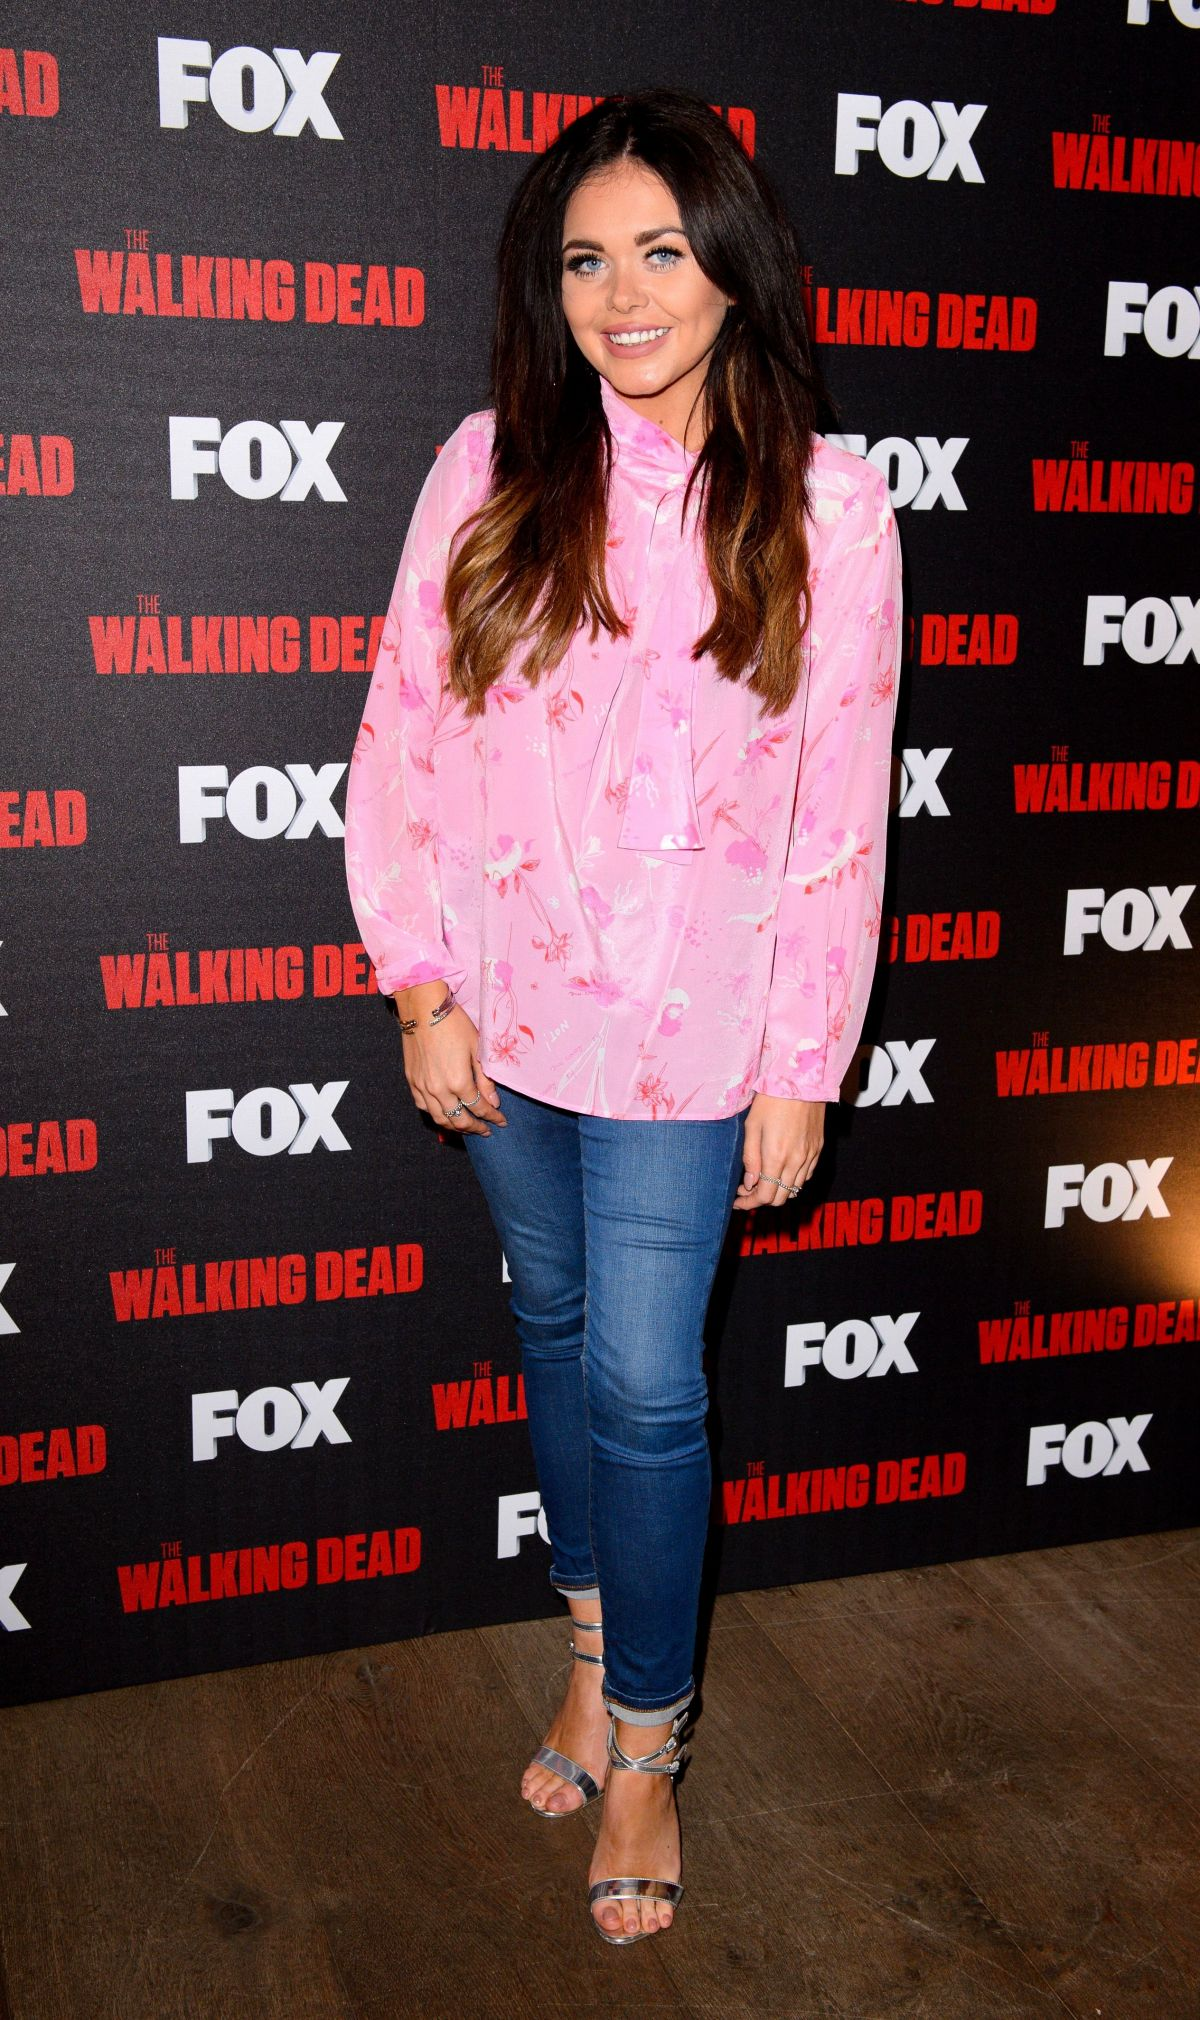 SCARLETT MOFFATT at A night with The Walking Dead Screening in London 03/03/2017